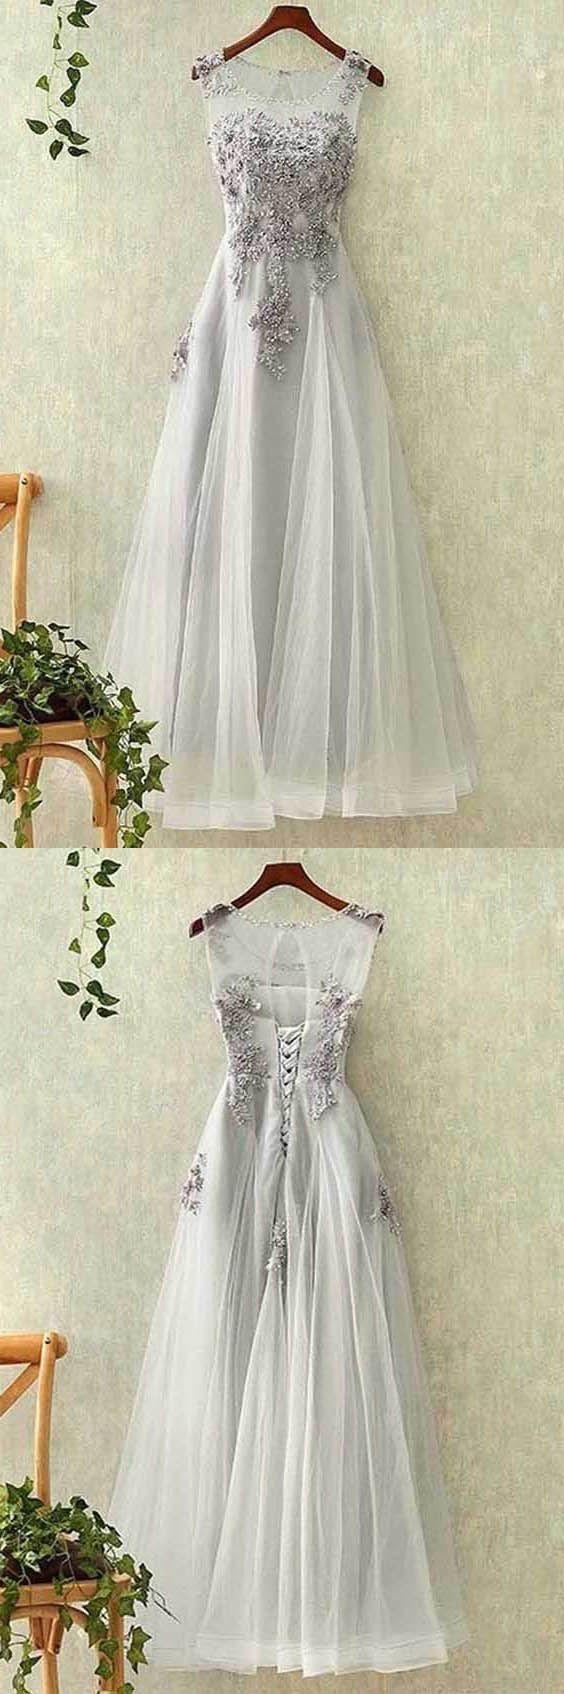 Cheap splendid prom dresses long elegant tulle lace applique long